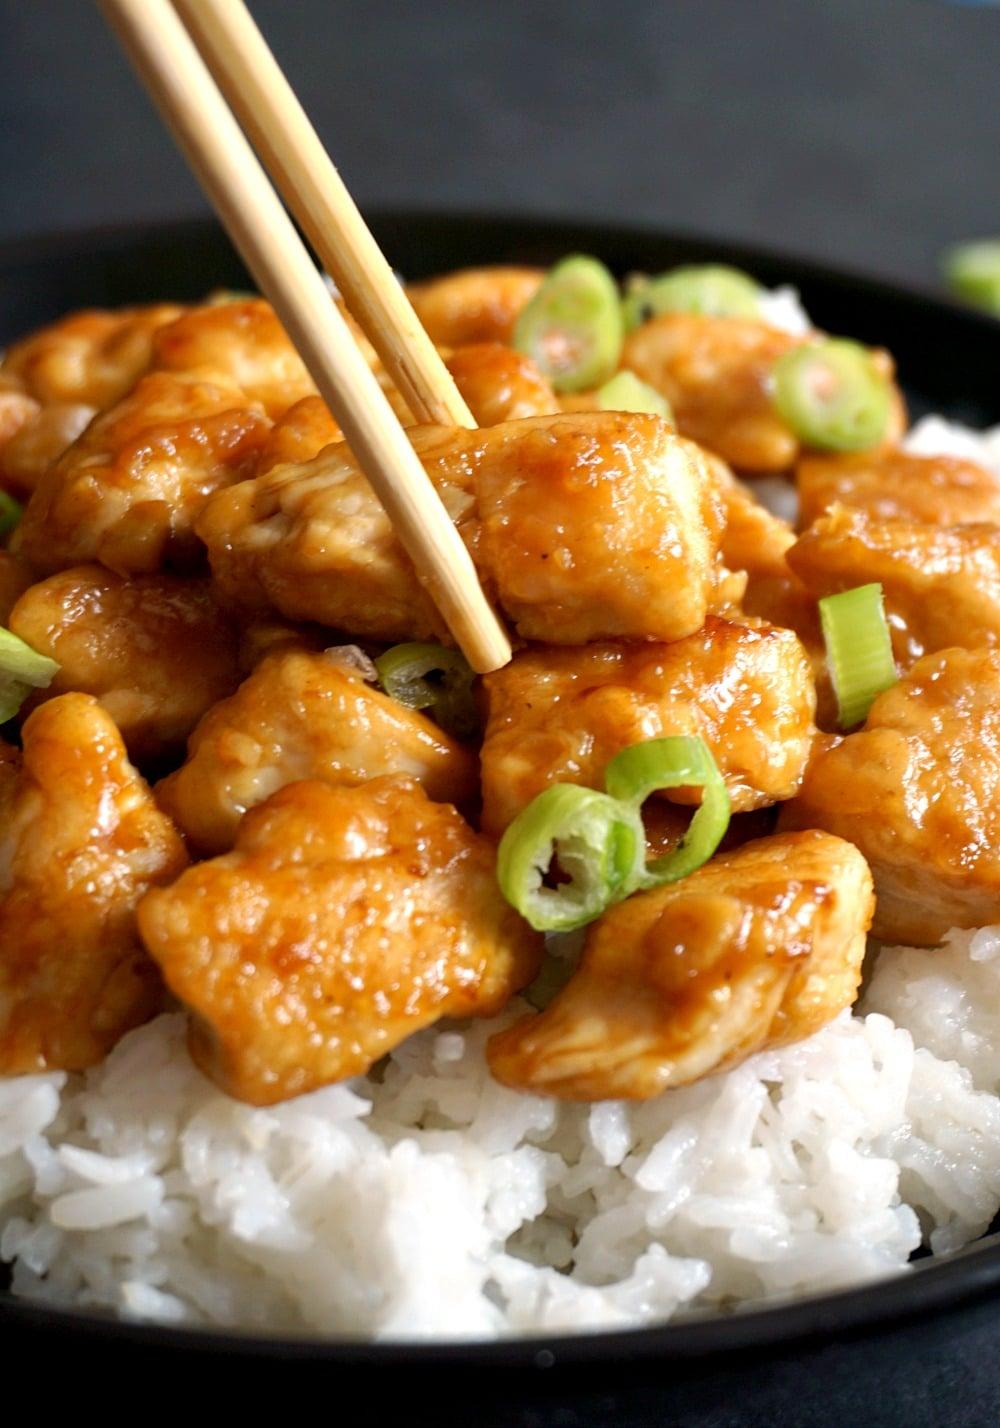 Easy orange chicken recipe